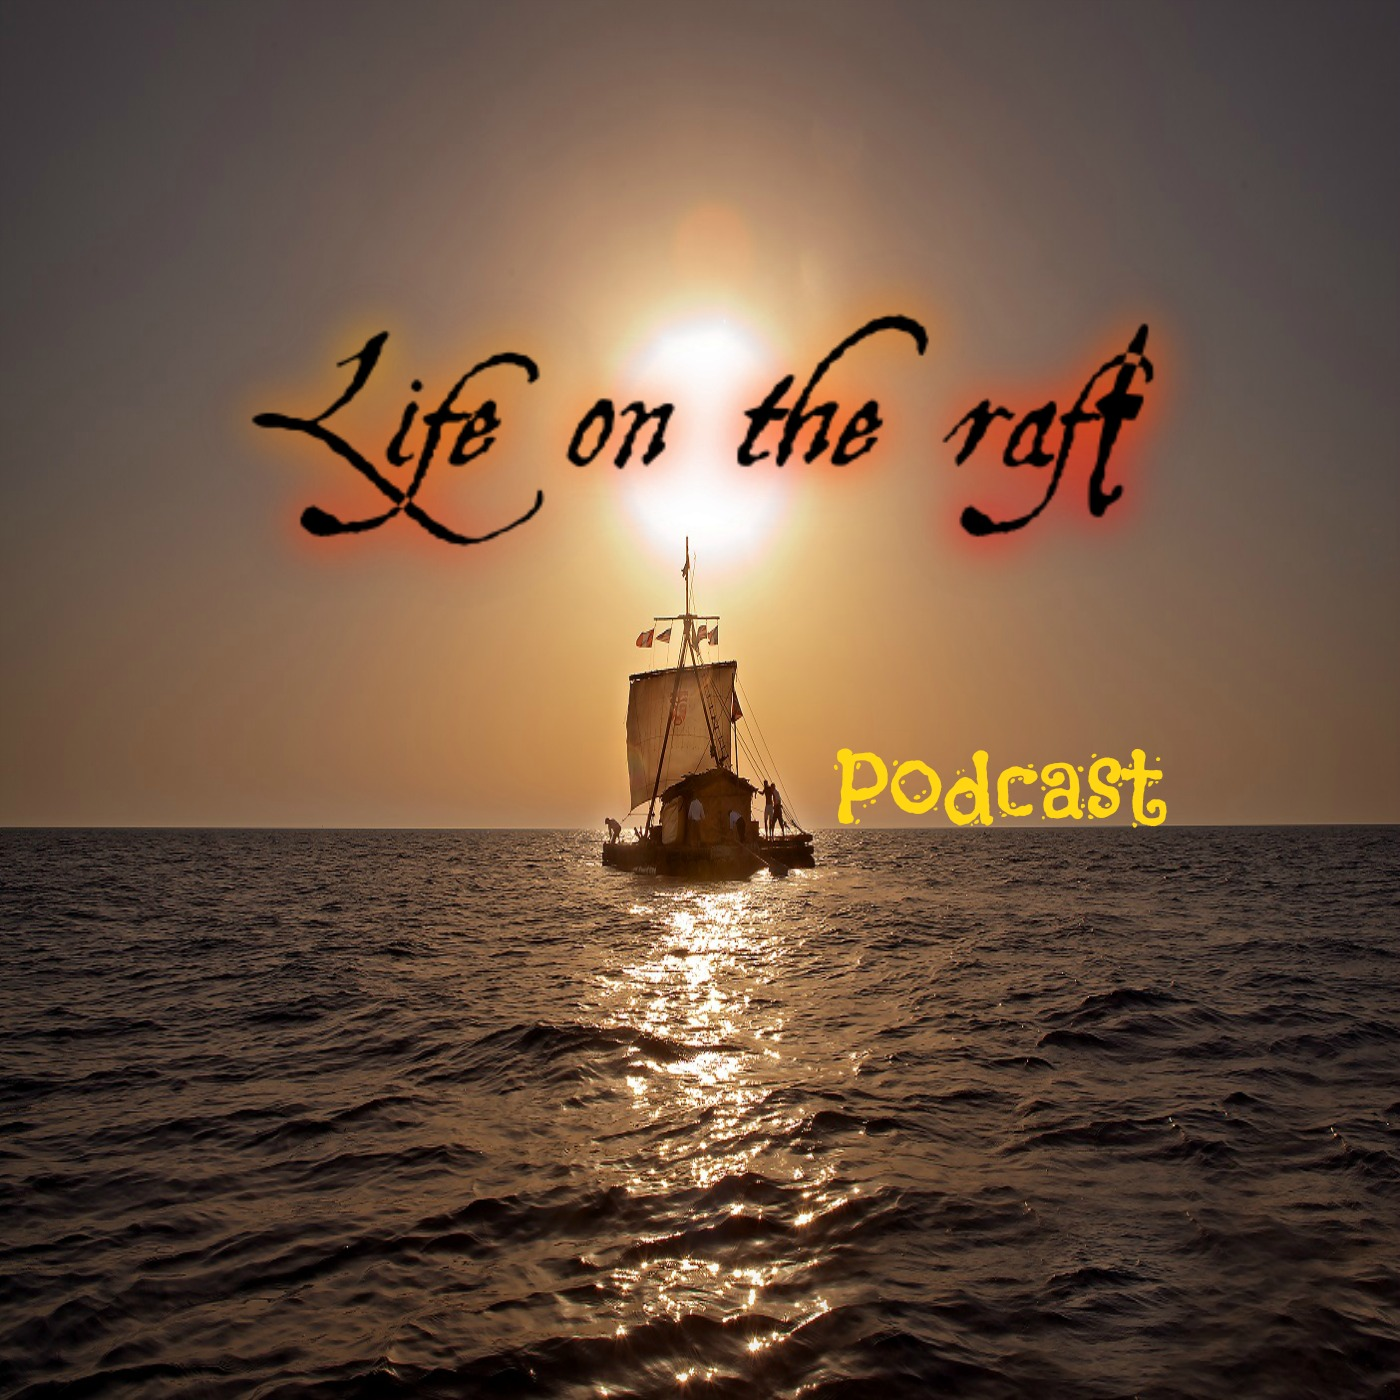 lifeontheraft's podcast